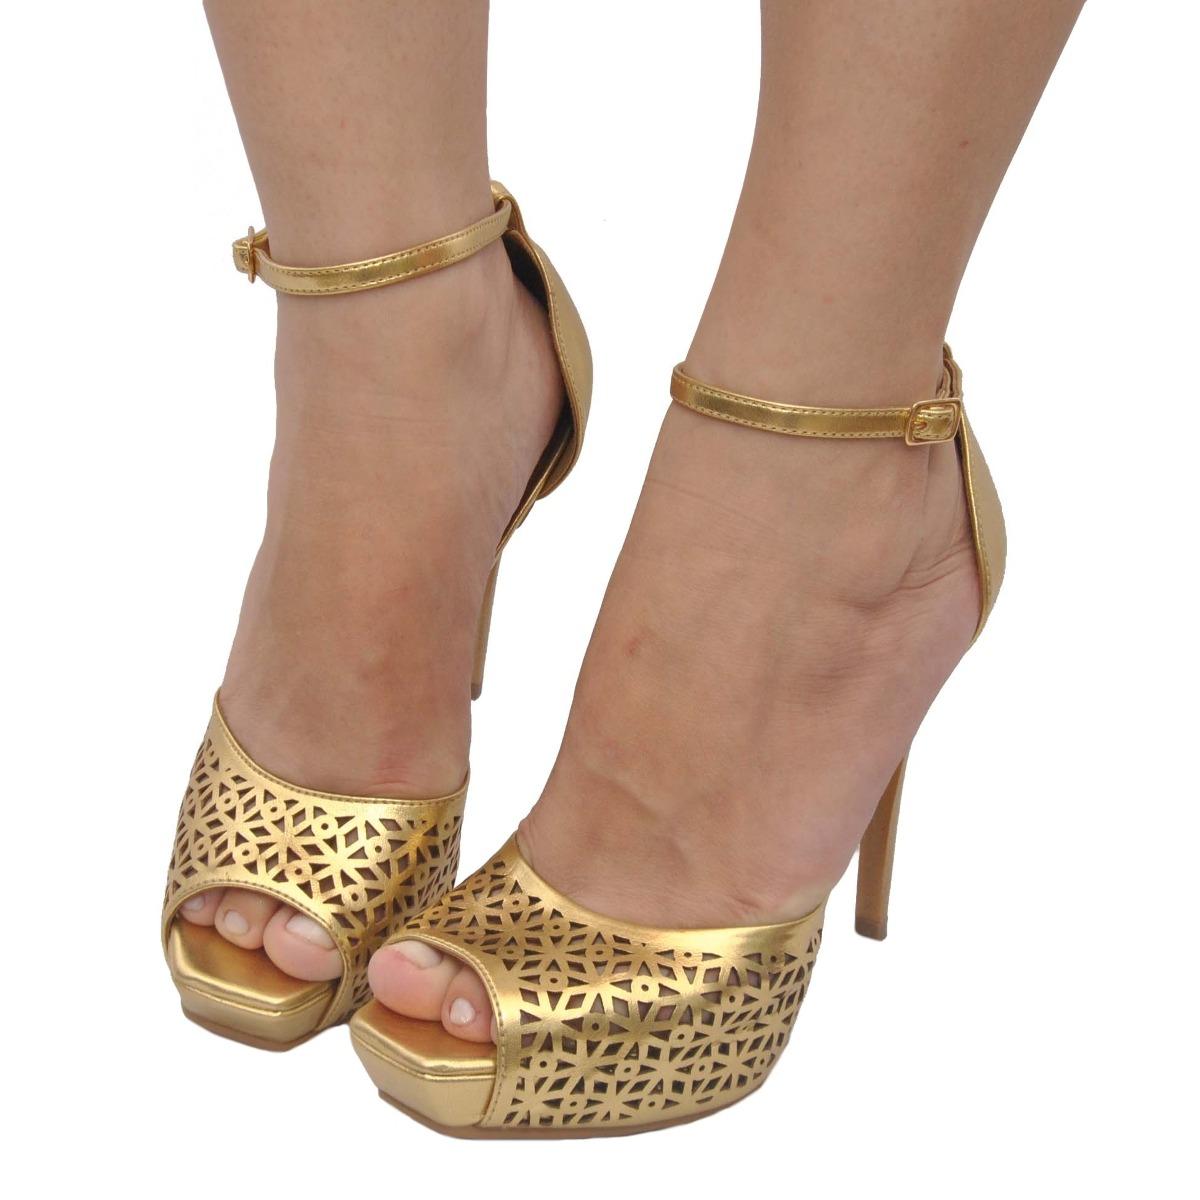 c3a35d8f3 Carregando zoom... sandália feminina peep toe plataforma dourada festa  miucha